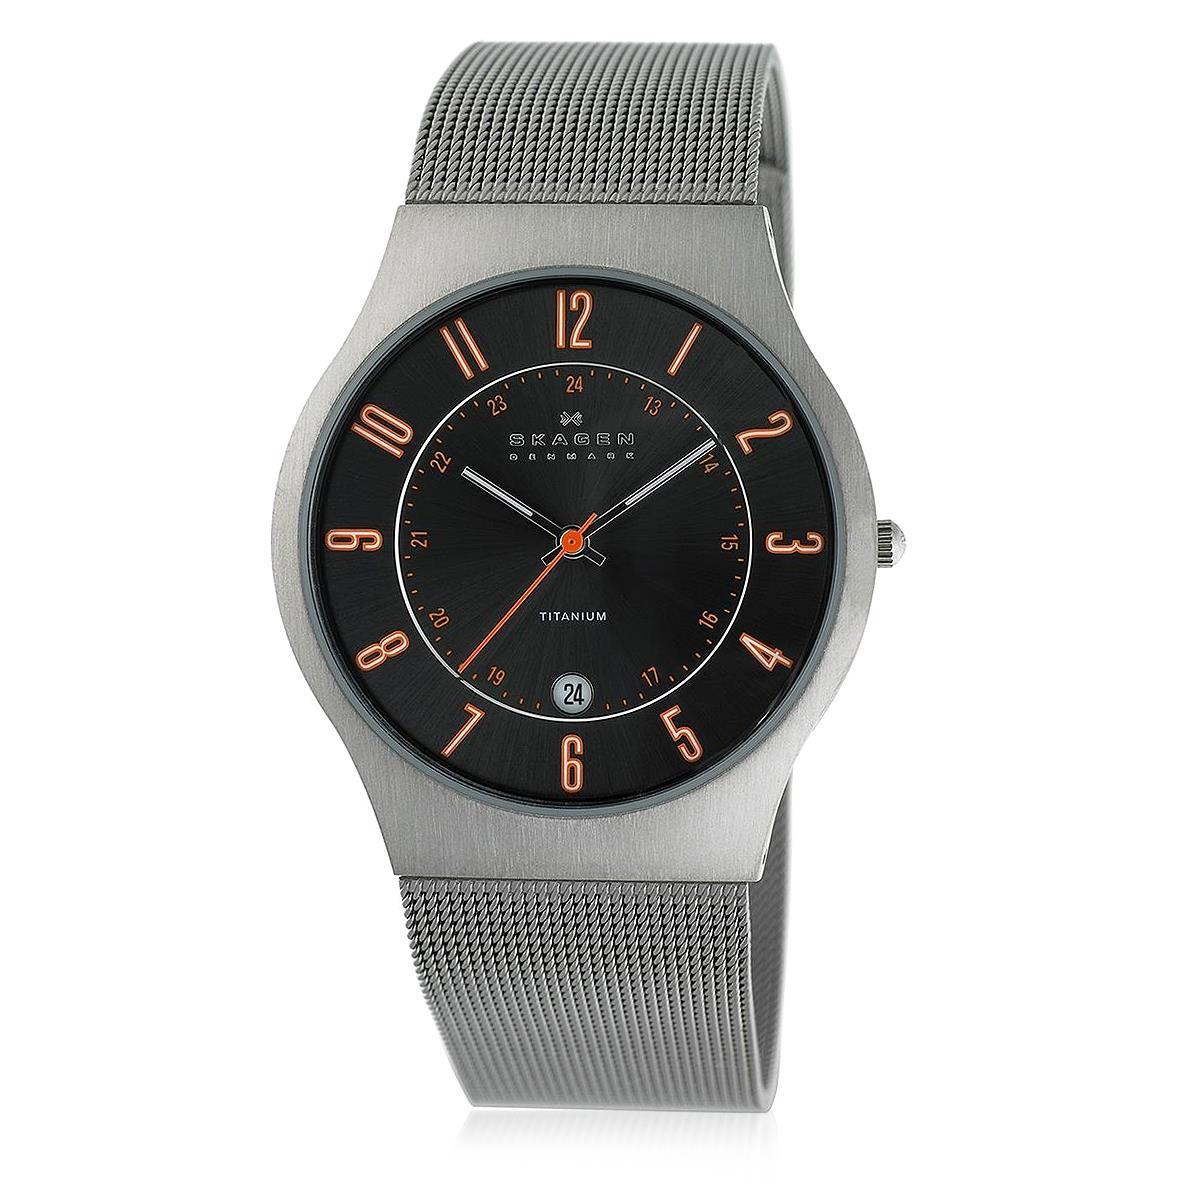 Relógio Masculino Skagen Titanium Analógico 233XLTTMO Z Pulseira Esteira 625951b979